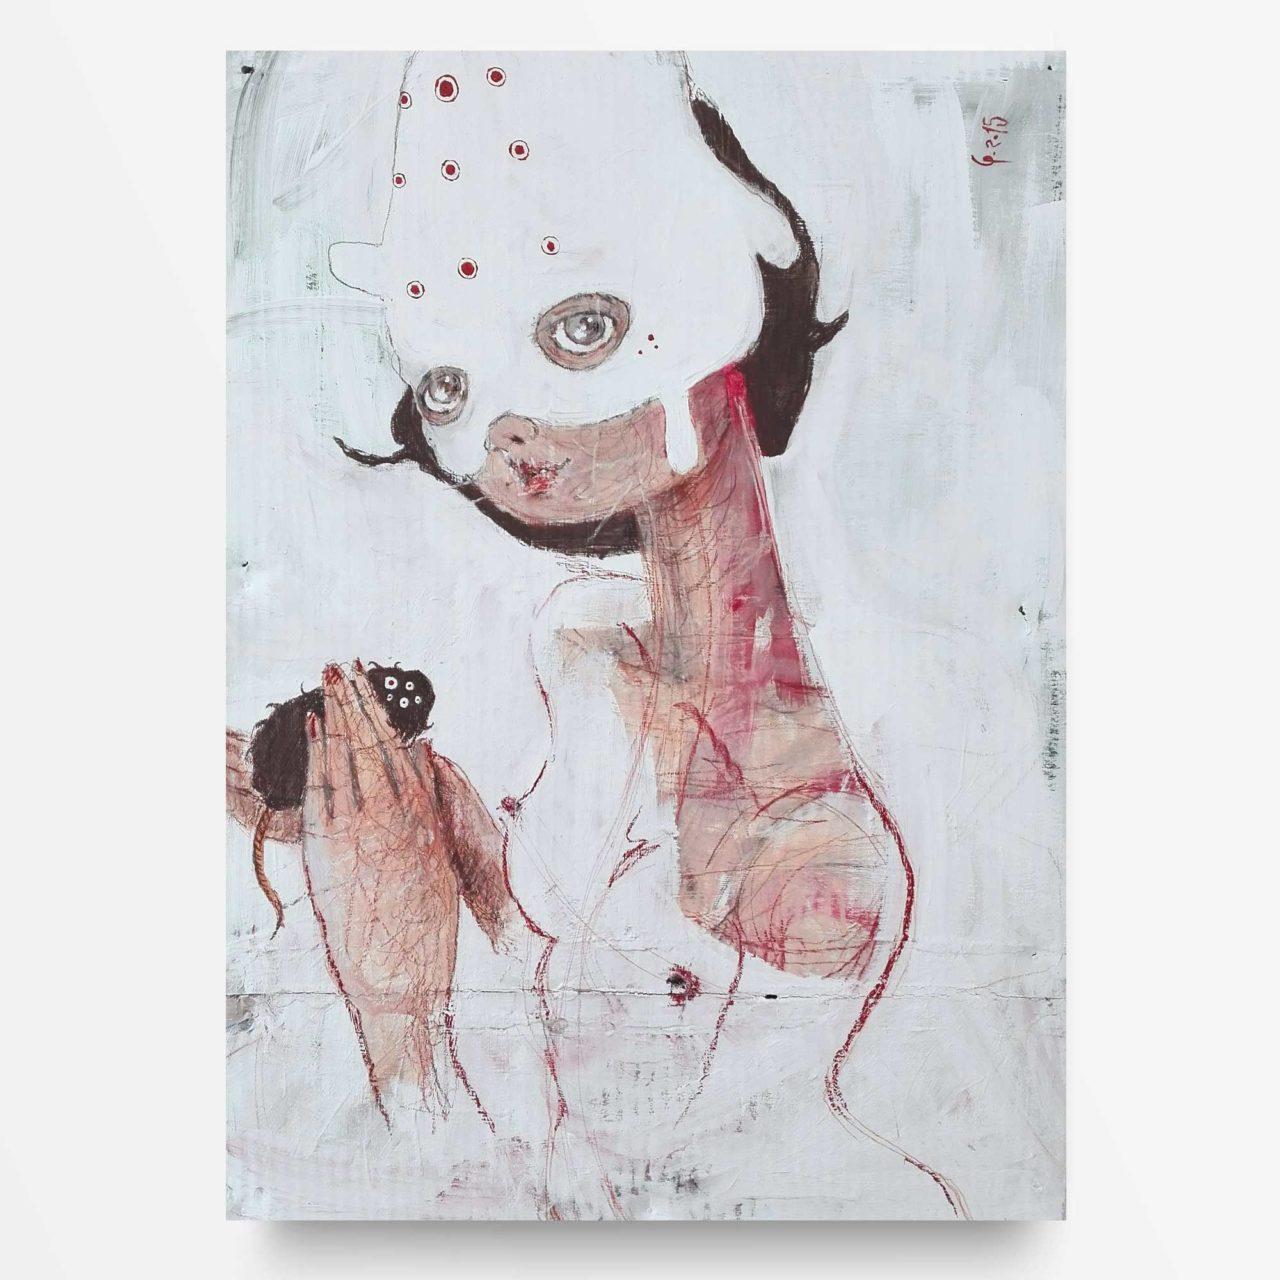 2015 Gaia Dea della Terra Quadro Arte Sacra Diego Gabriele